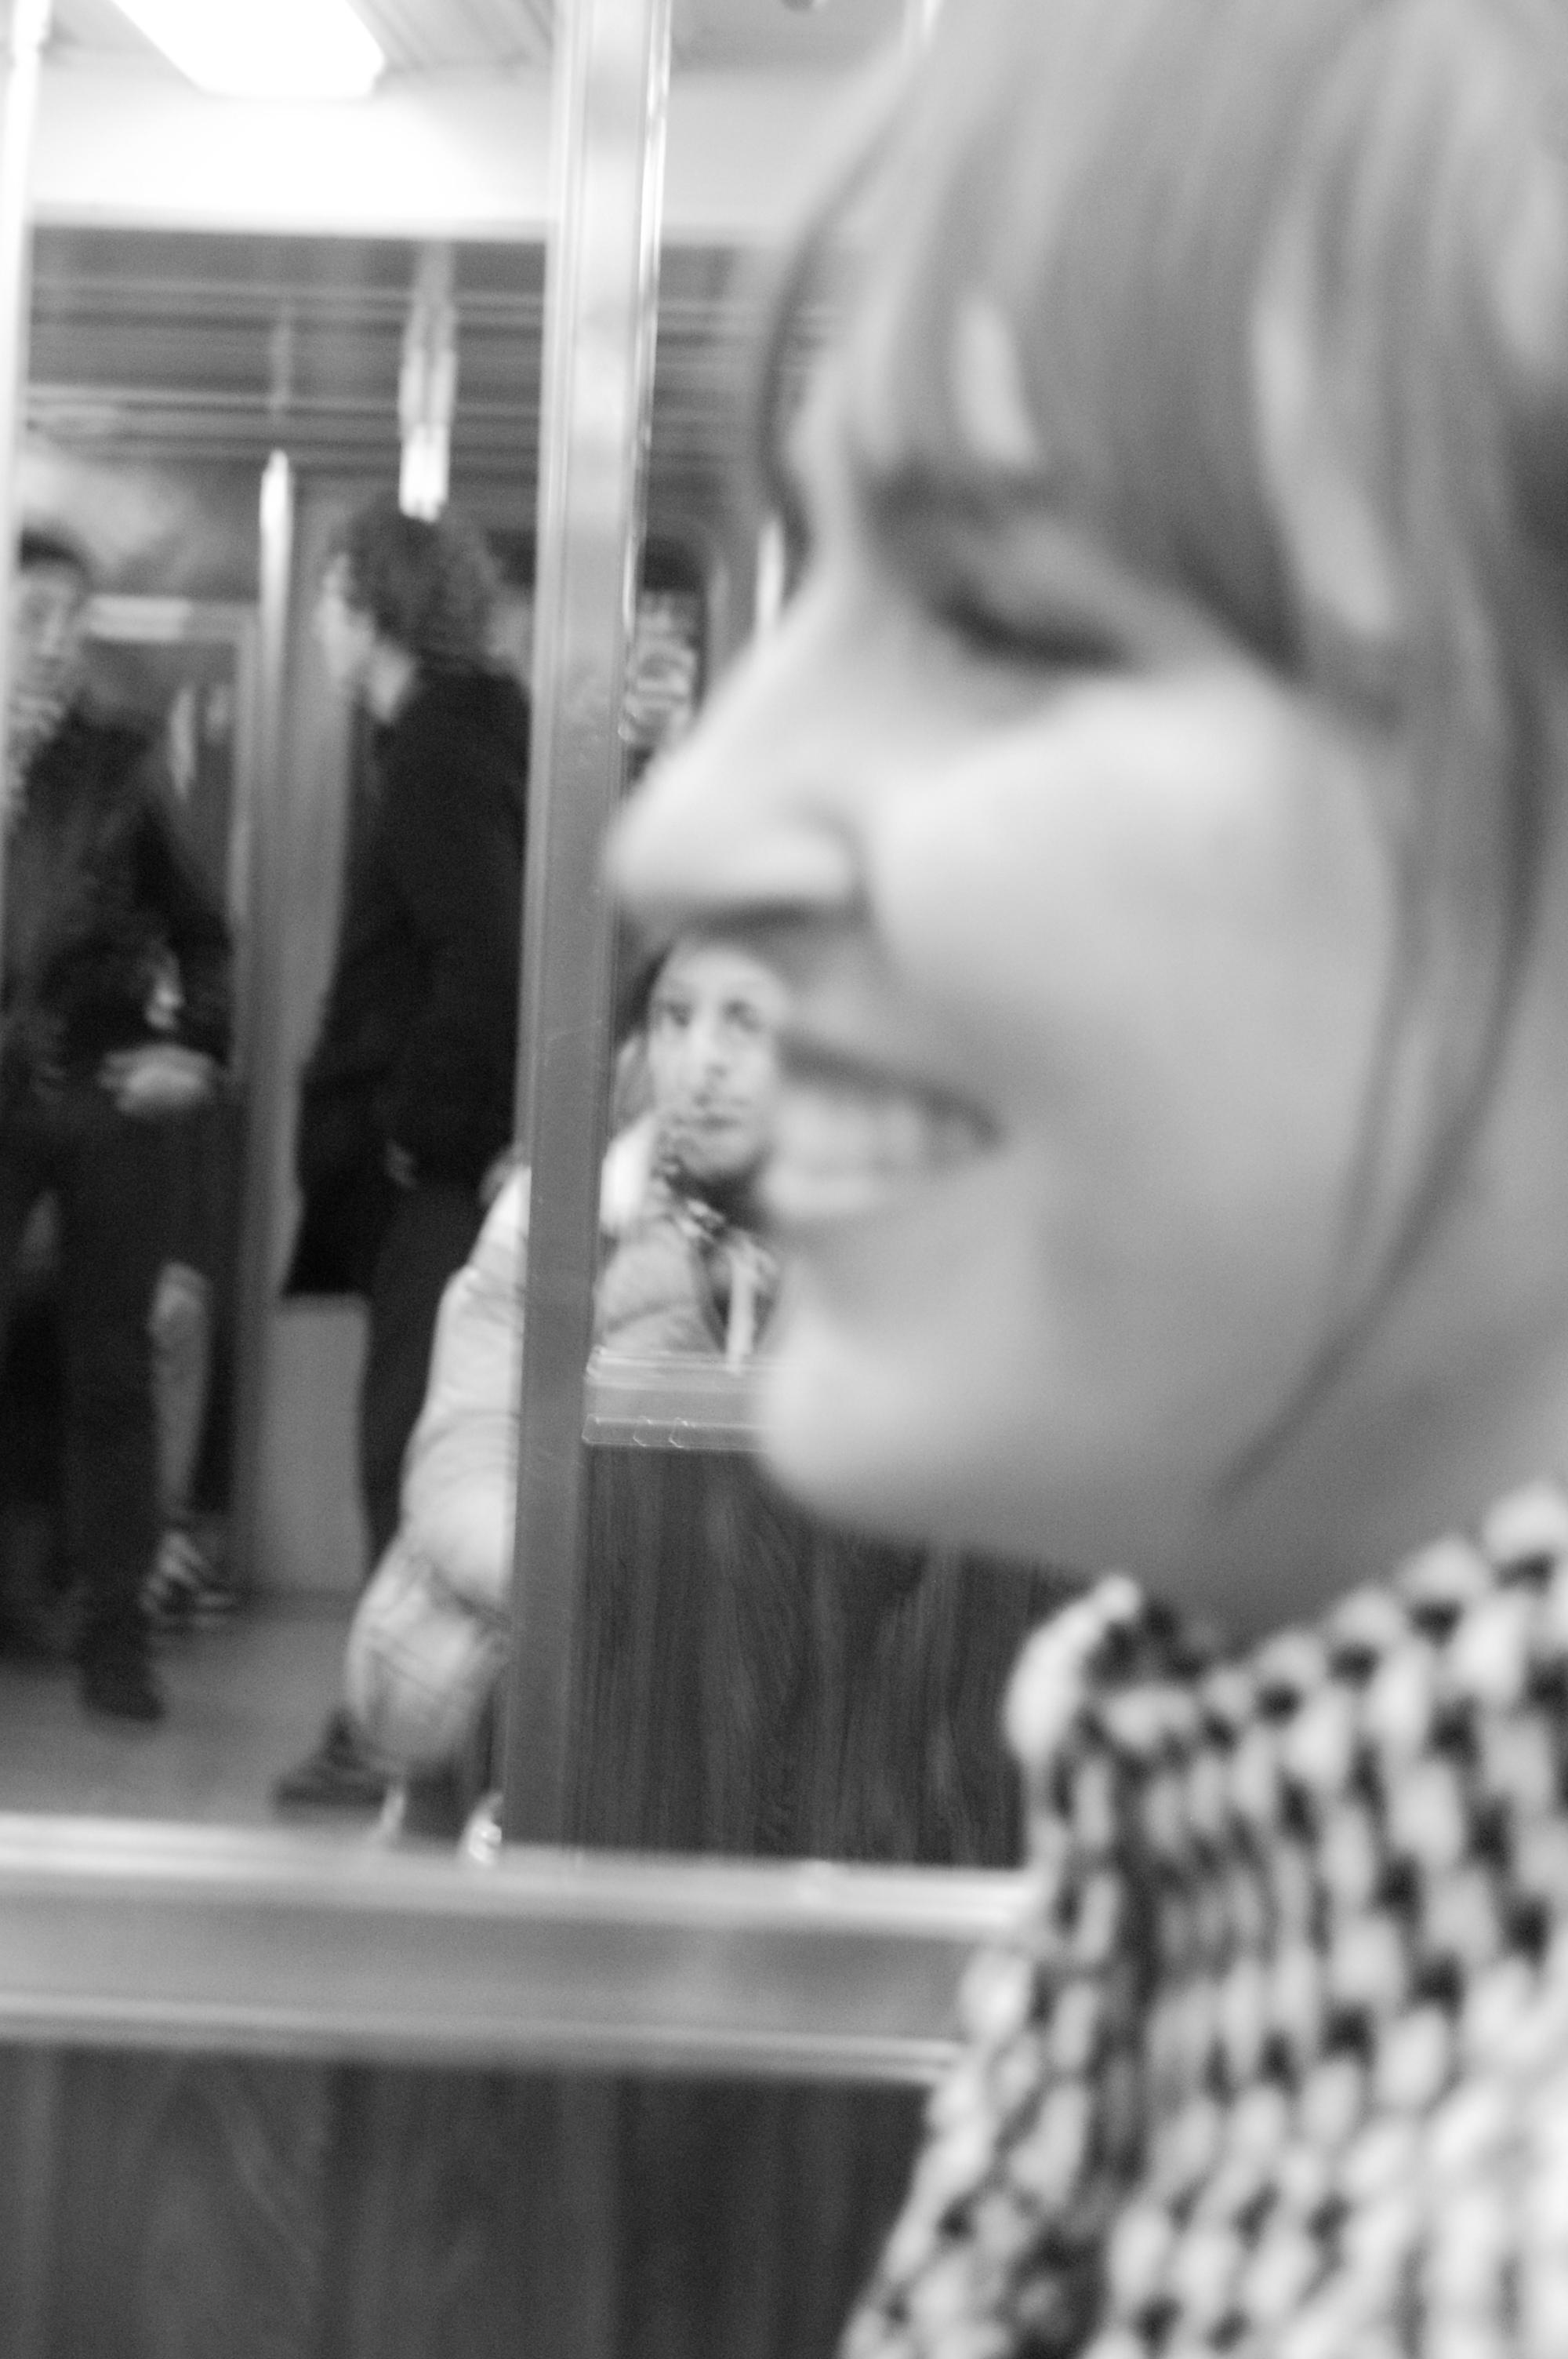 Barlett on the train